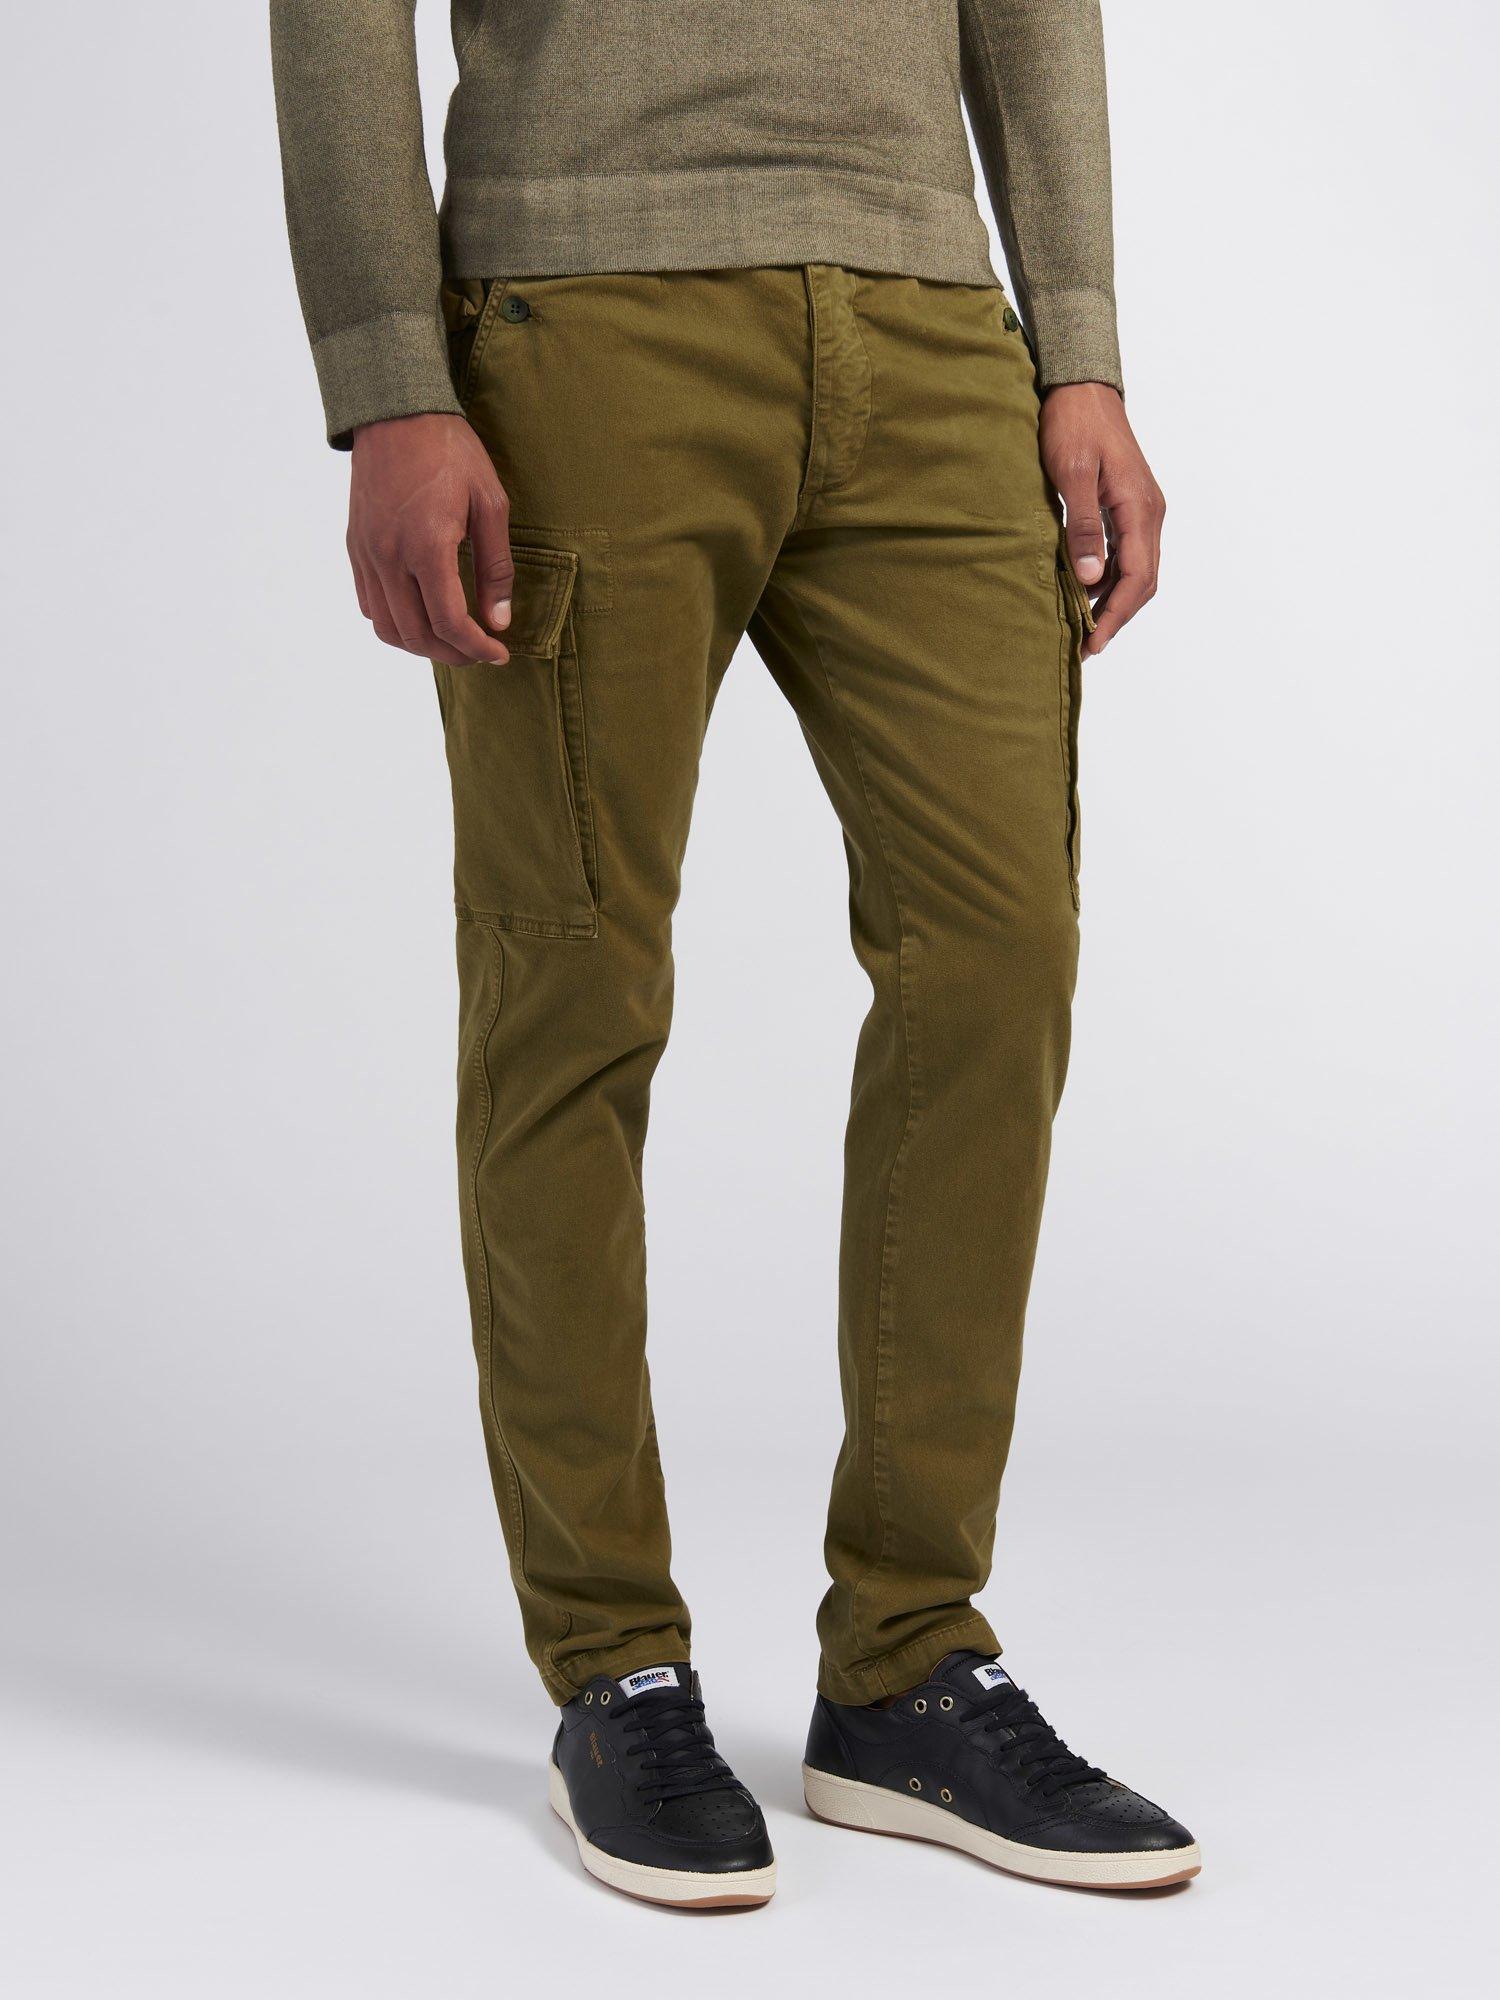 Blauer - GARMENT-DYED STRETCH PANTS - Light Military Green - Blauer